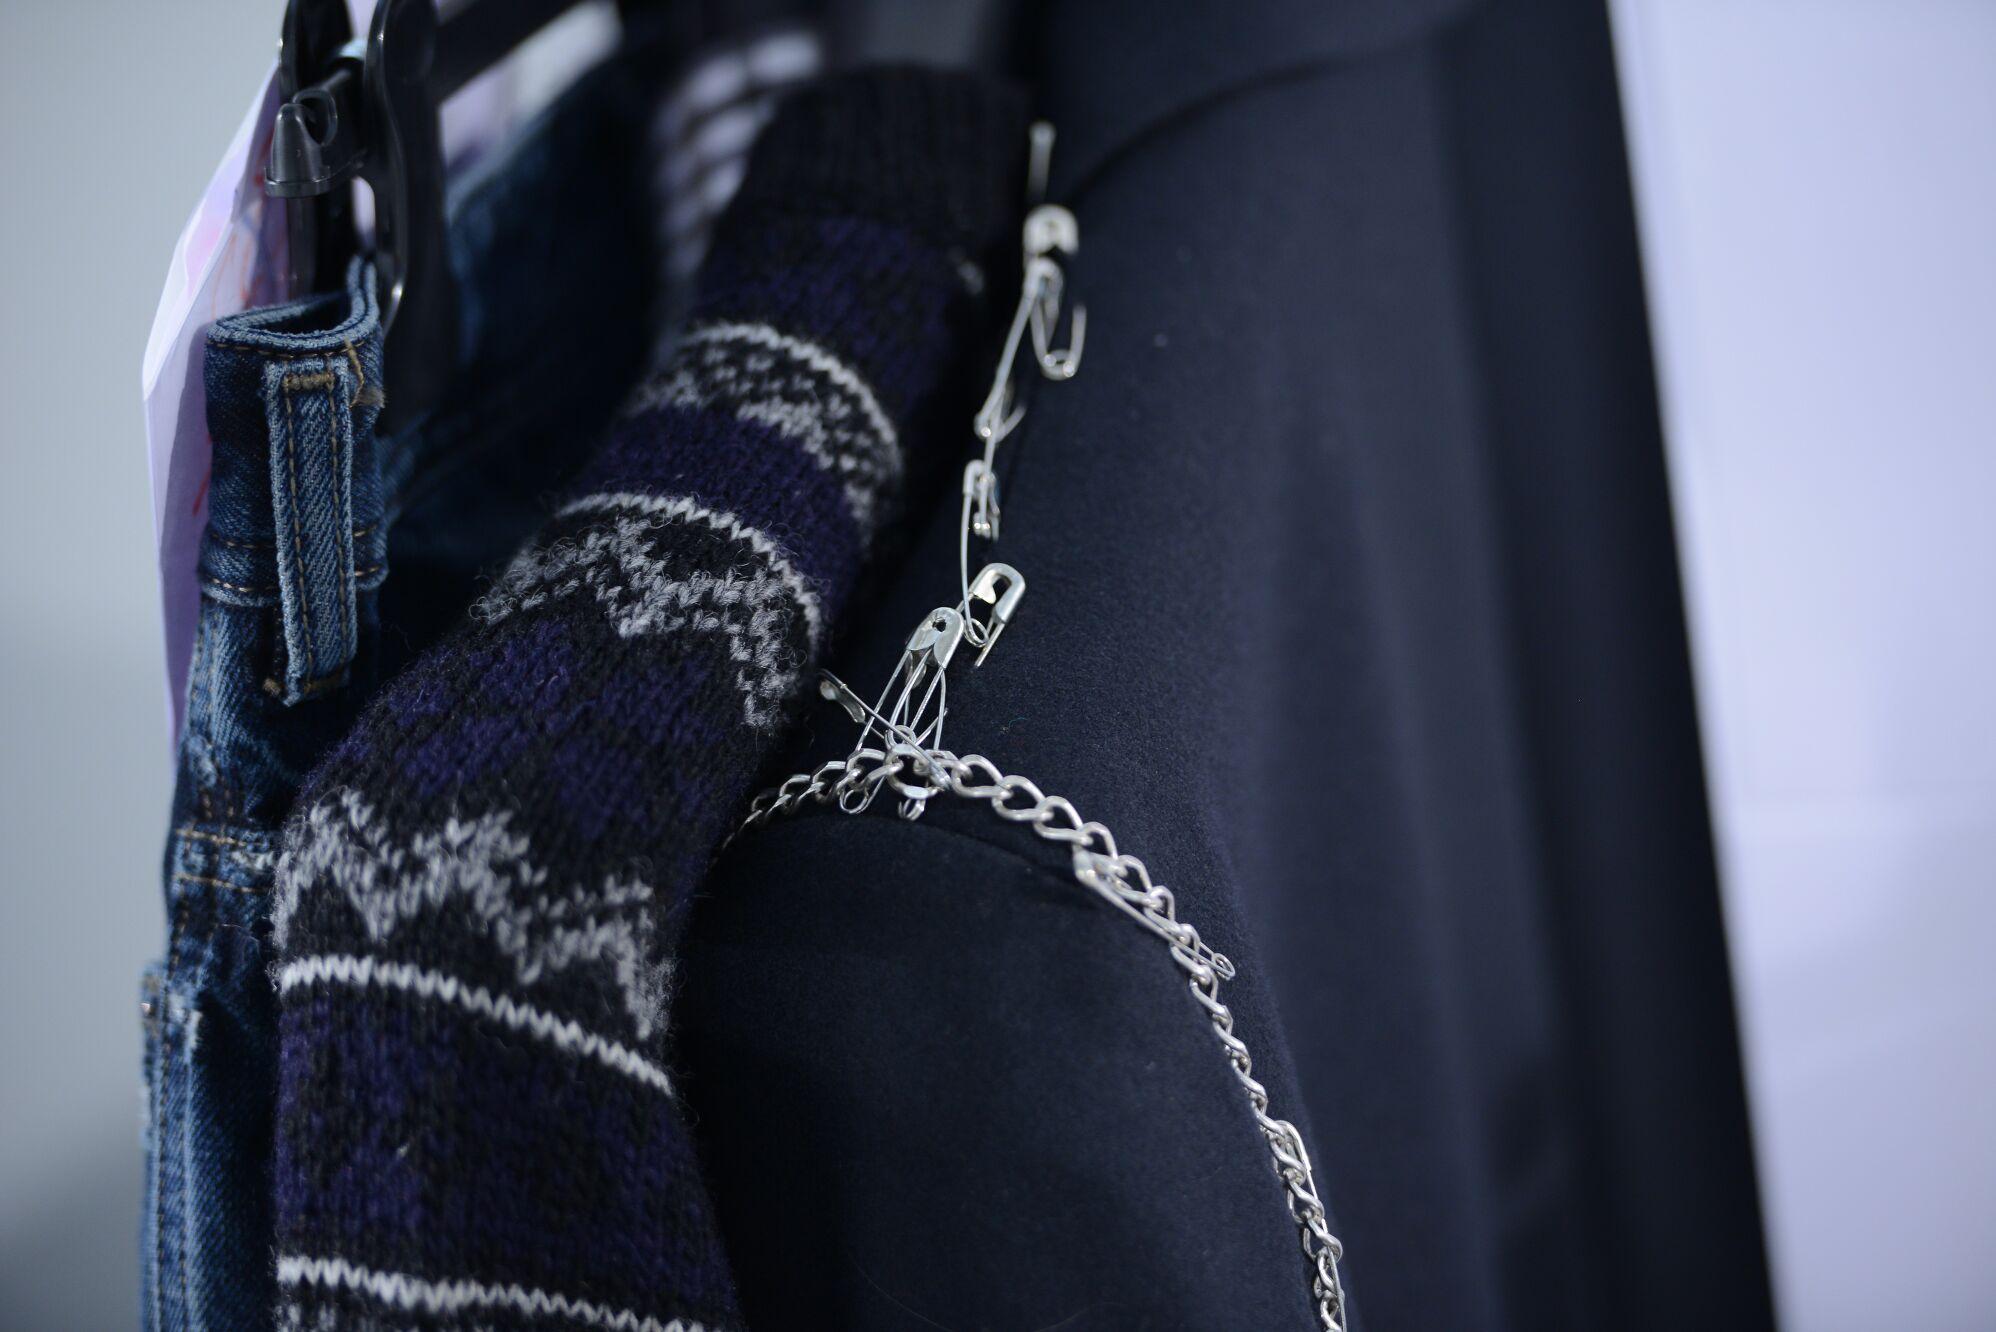 Backstage Diesel Black Gold Menswear Detail